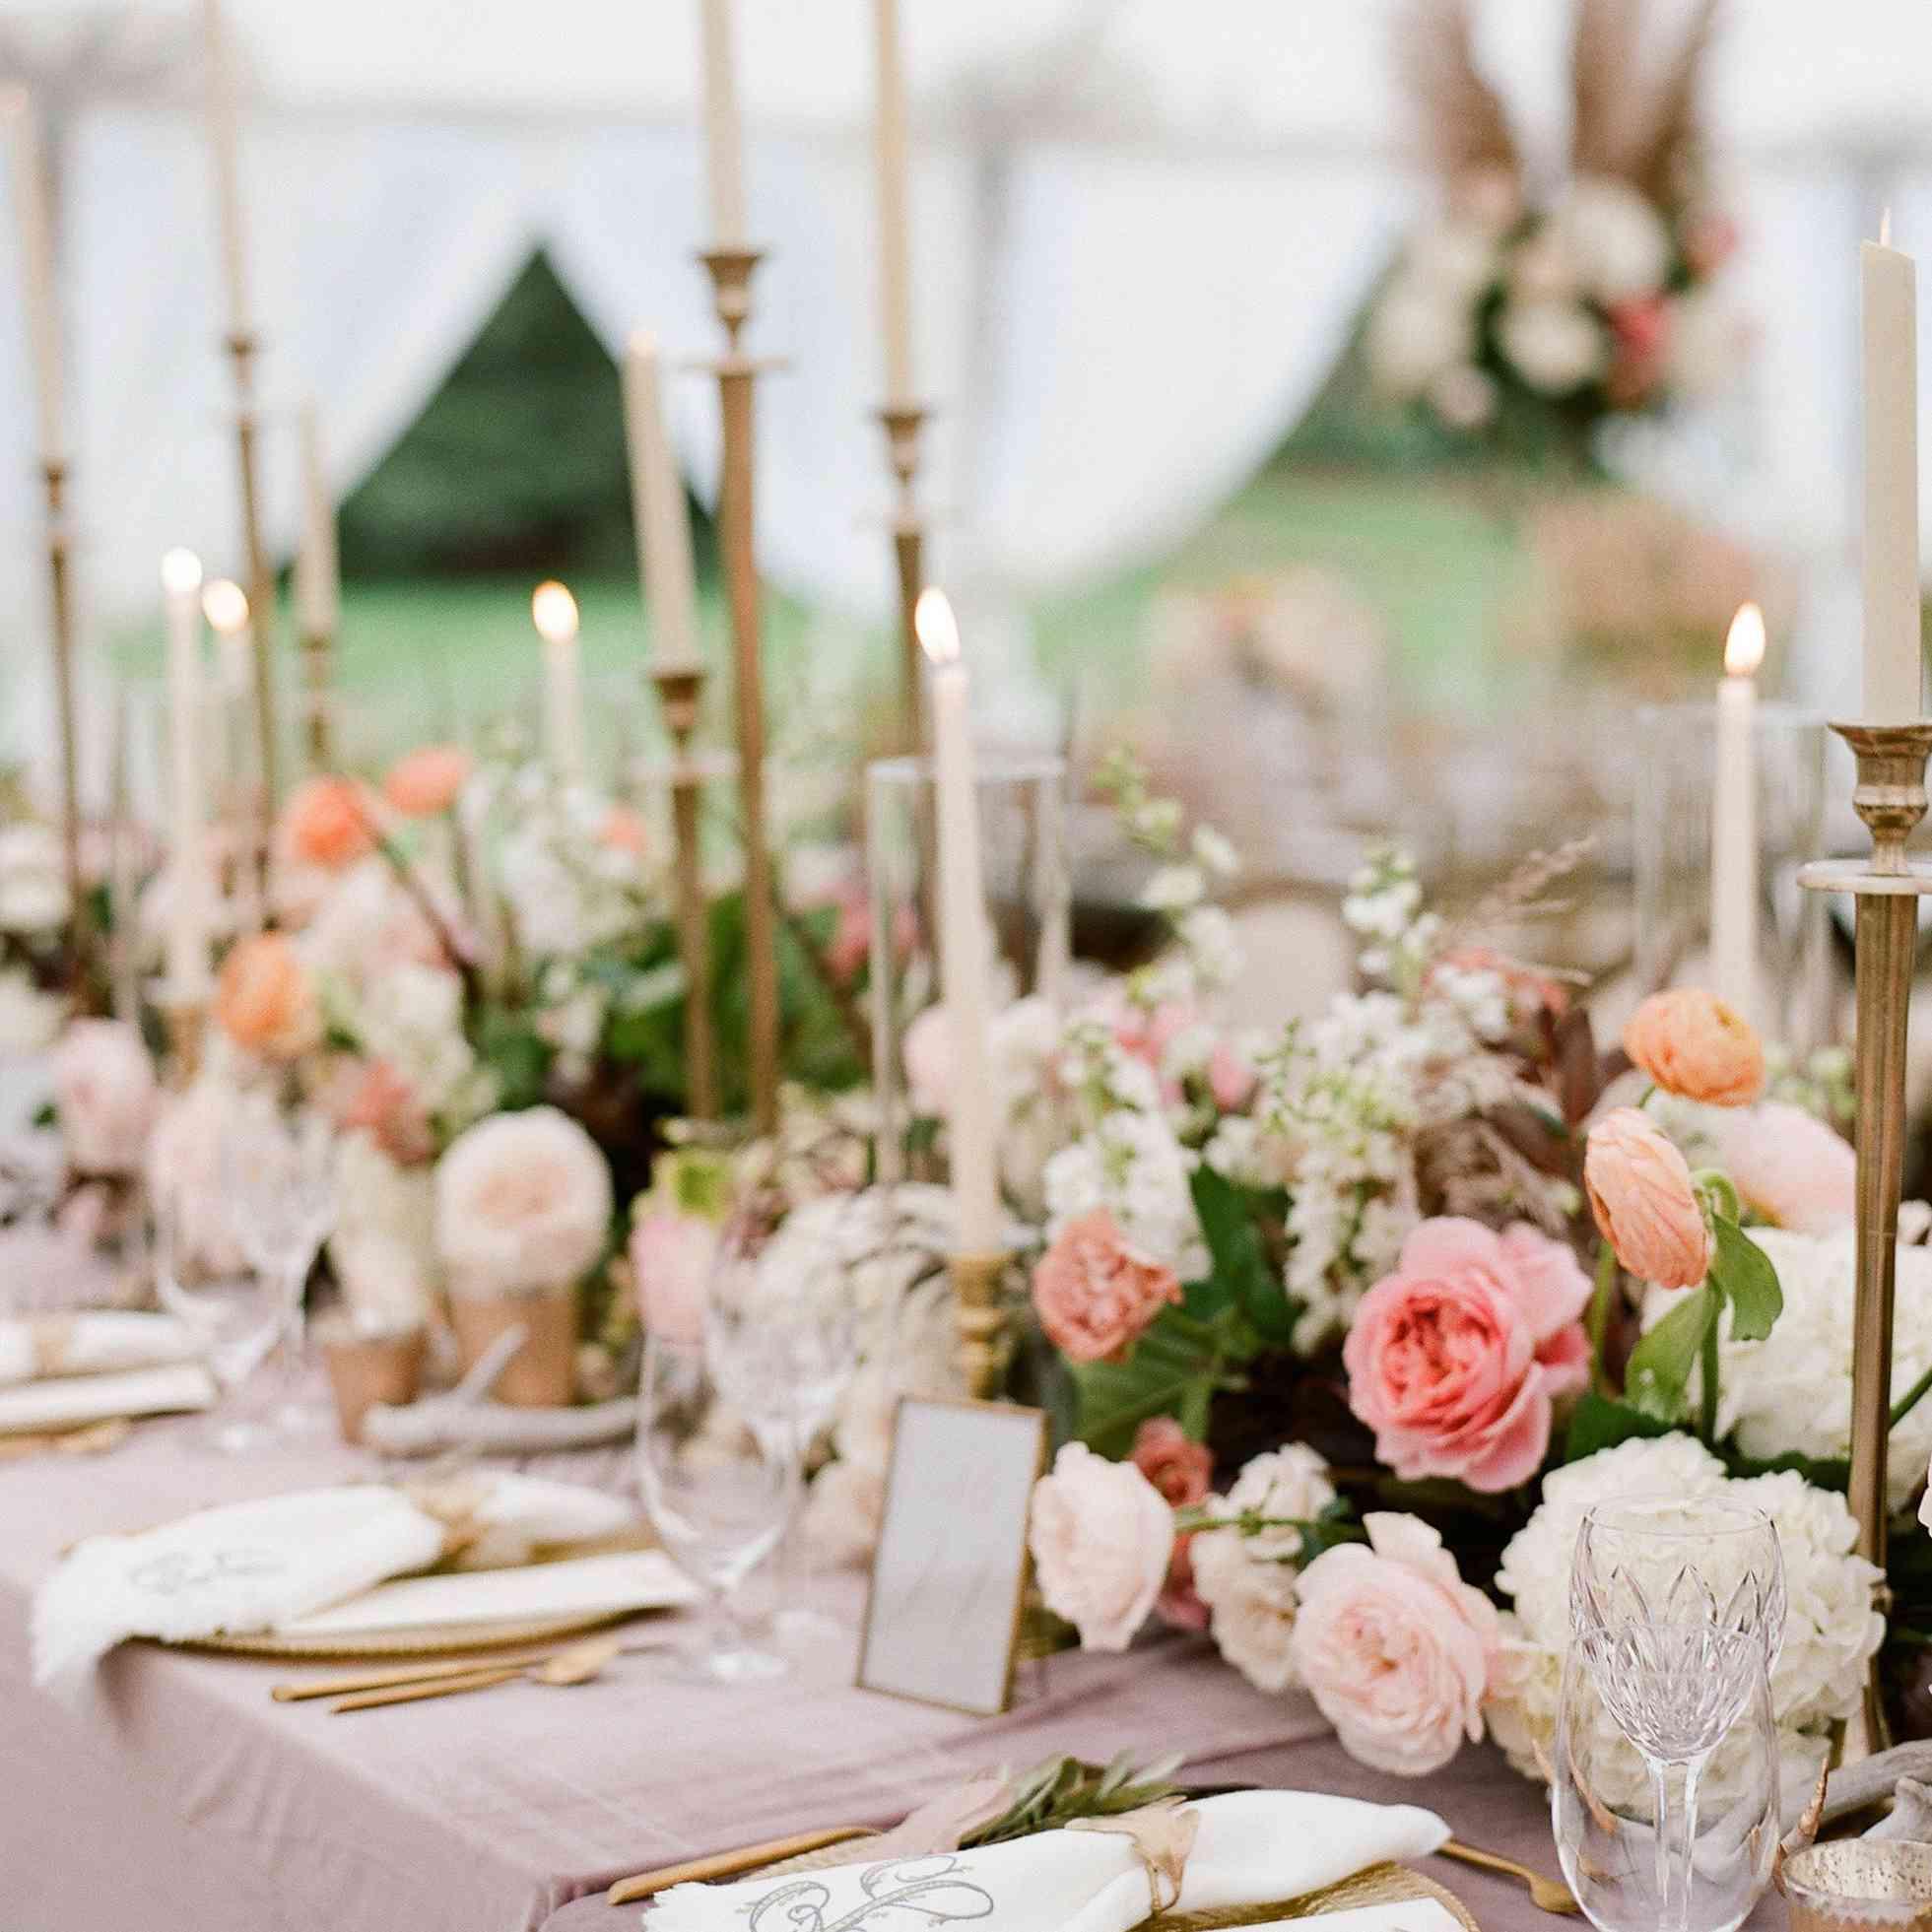 pink velvet tablecloth